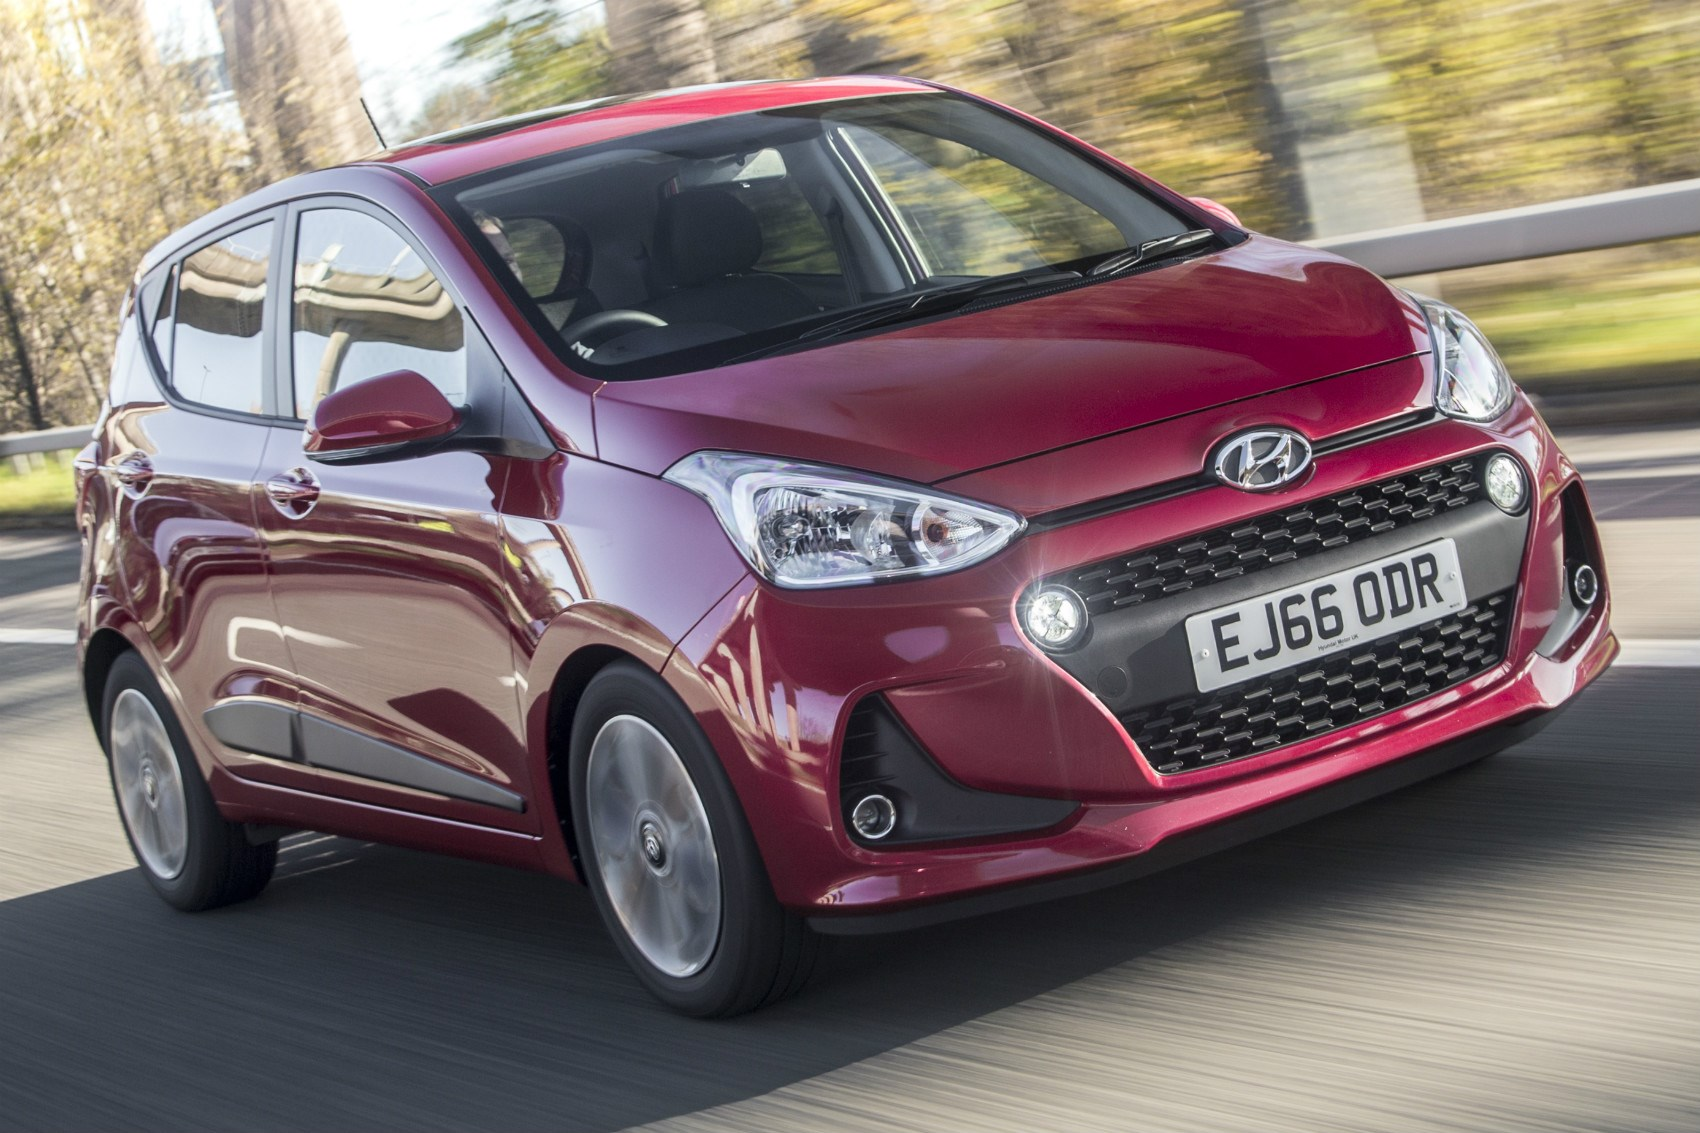 PCP finance best new car deals for under £90 per month